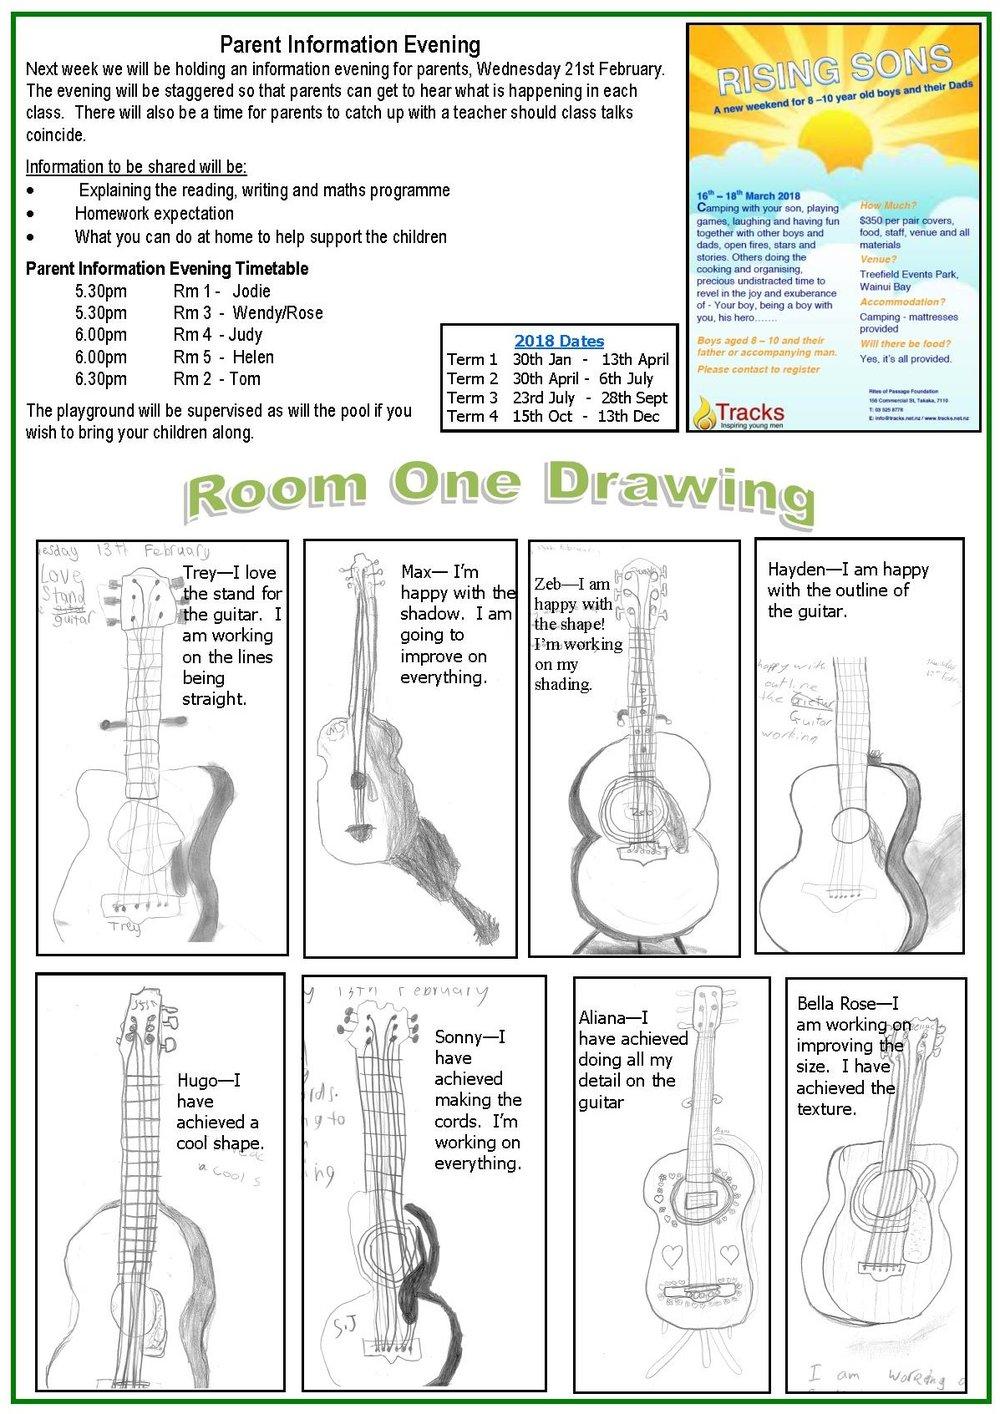 22nd Feb Page 4.jpg